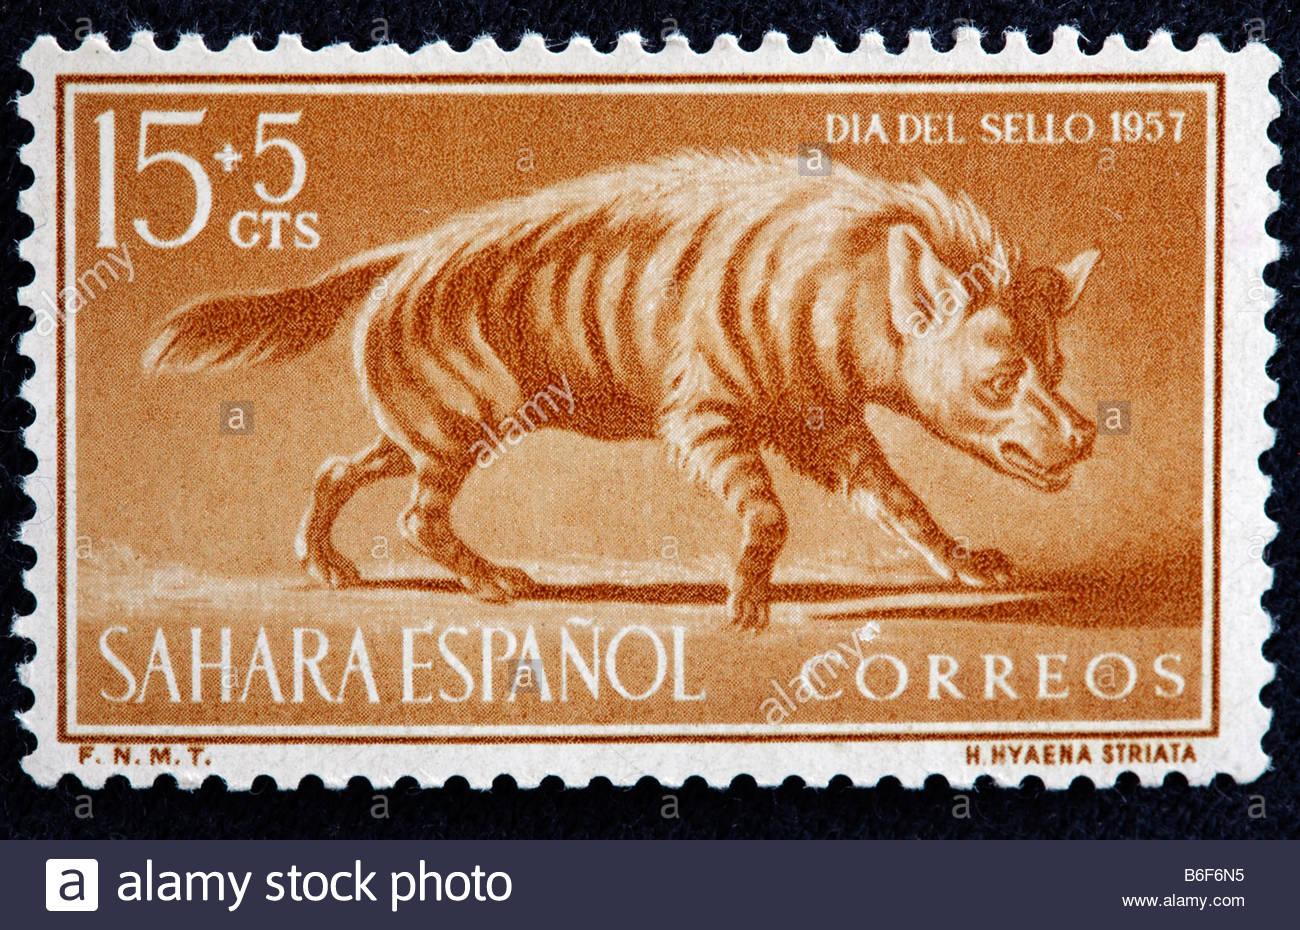 Striped Hyena (Hyaena hyaena), postage stamp, Spanish Sahara, 1957 - Stock Image